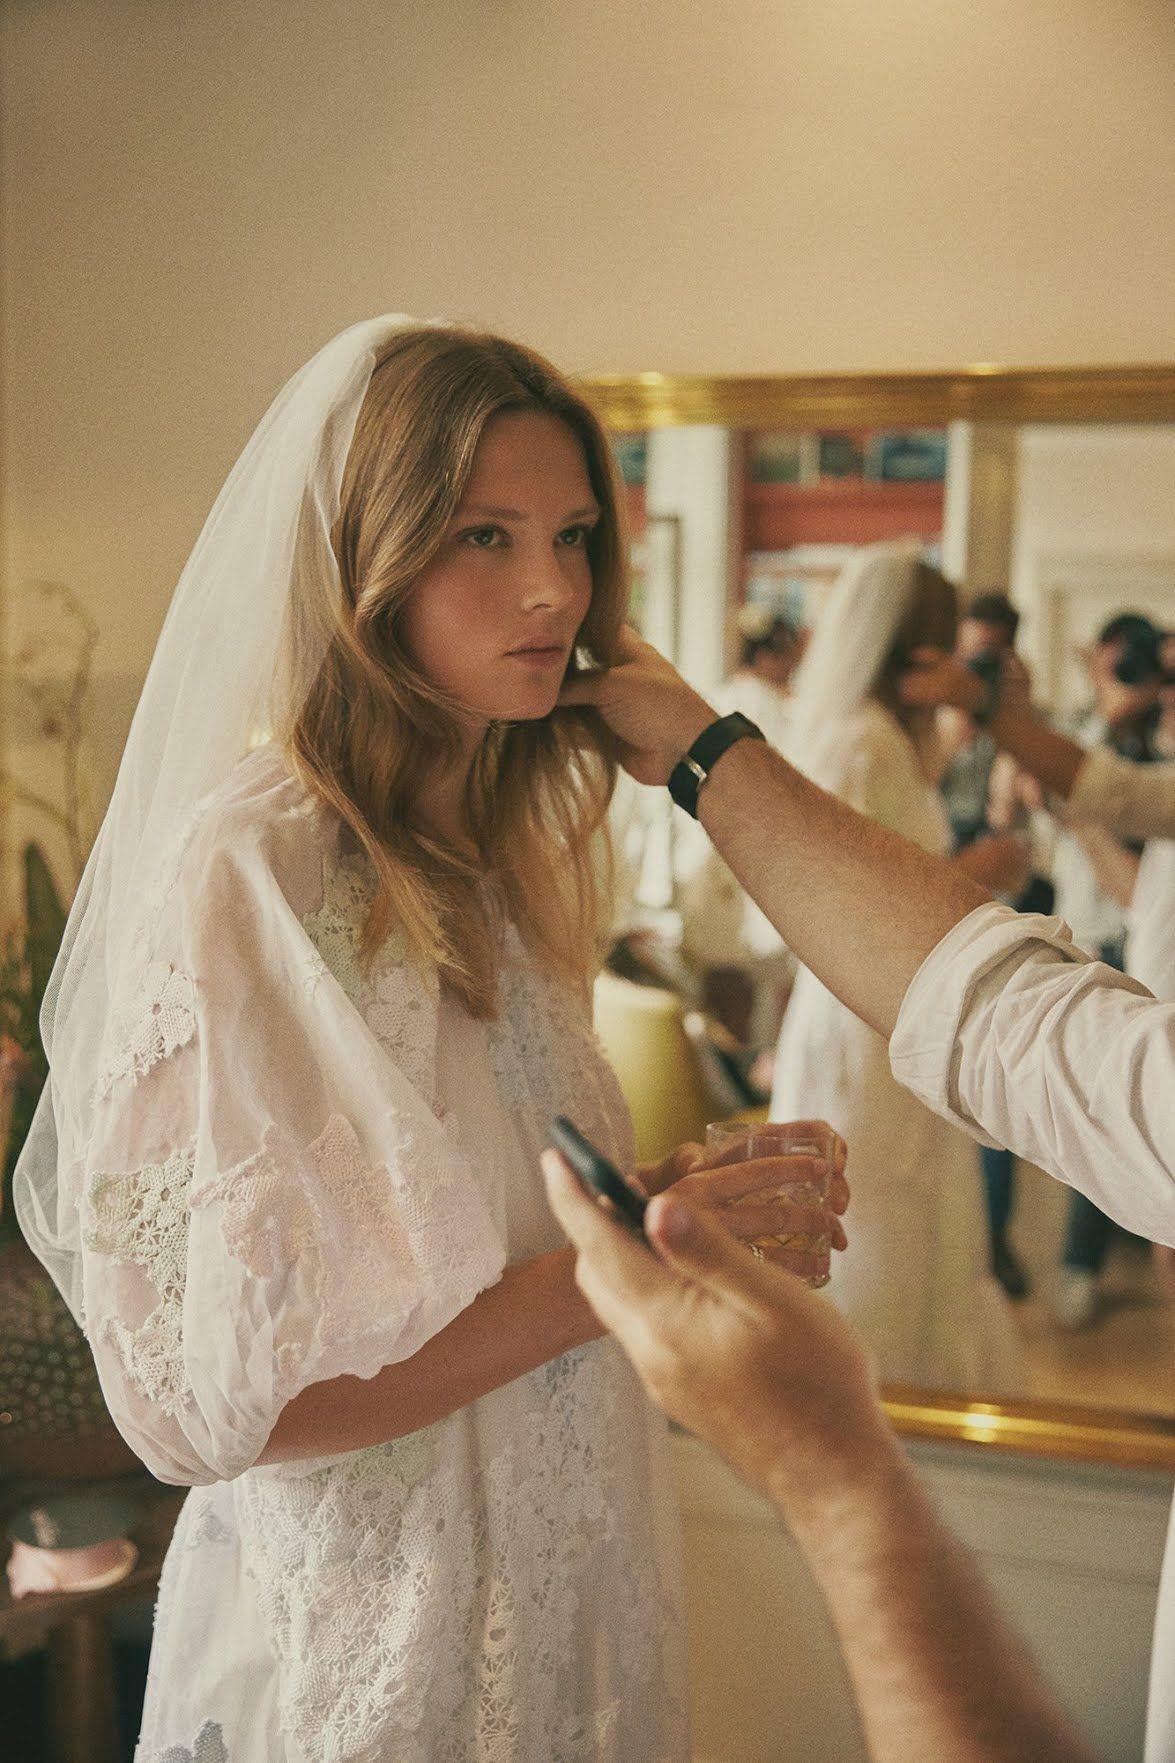 Caroline Brasch Nielsen And Frederik Bille Brahe Wedding Caroline Brasch Nielsen Bridal Inspiration Wedding Photography